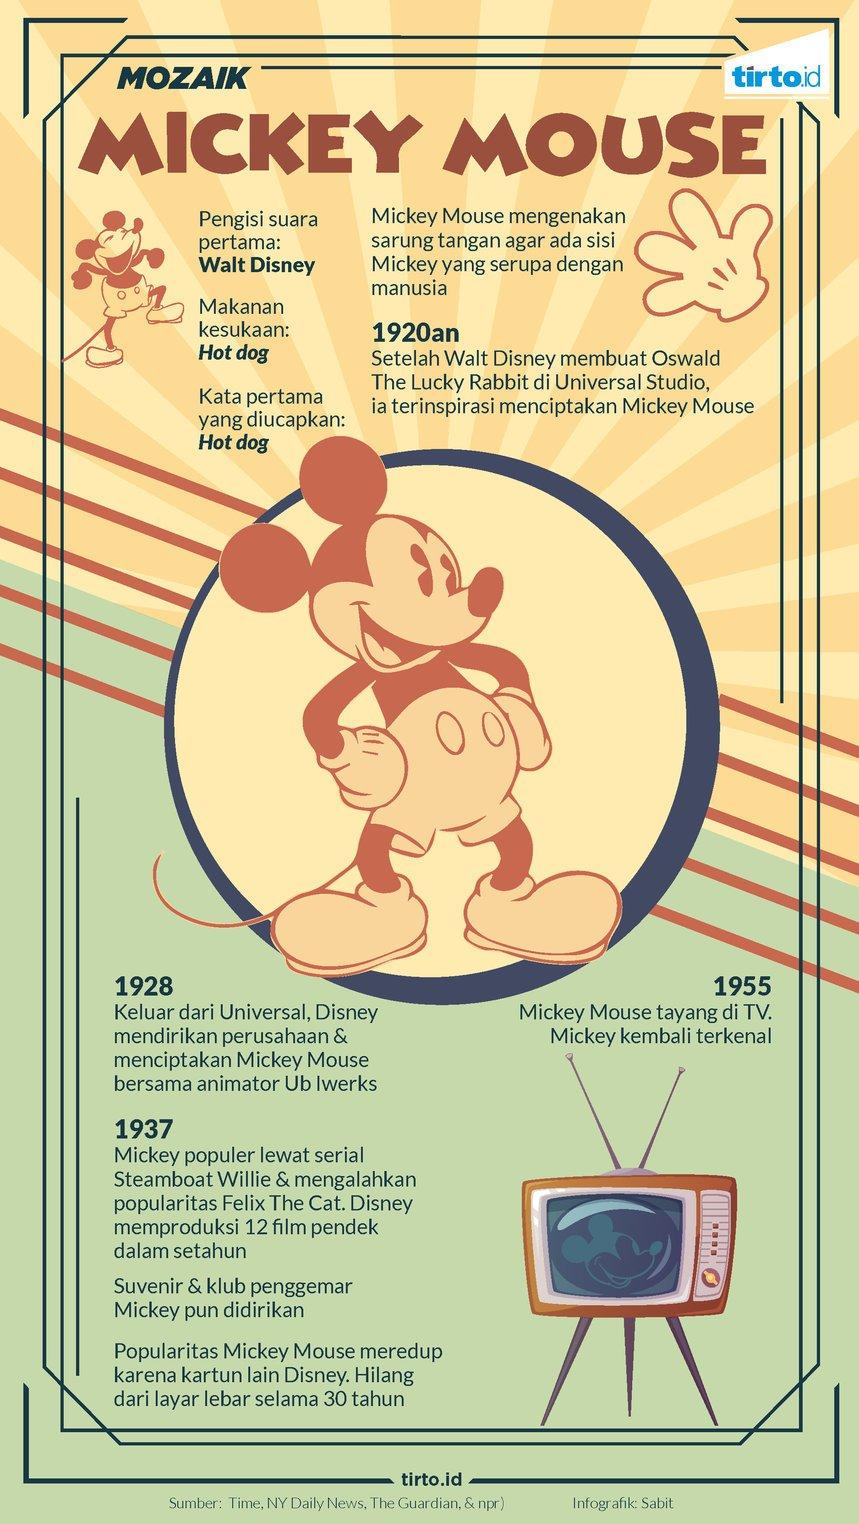 Mickey Mouse Pelipur Lara Walt Disney Tirto ID